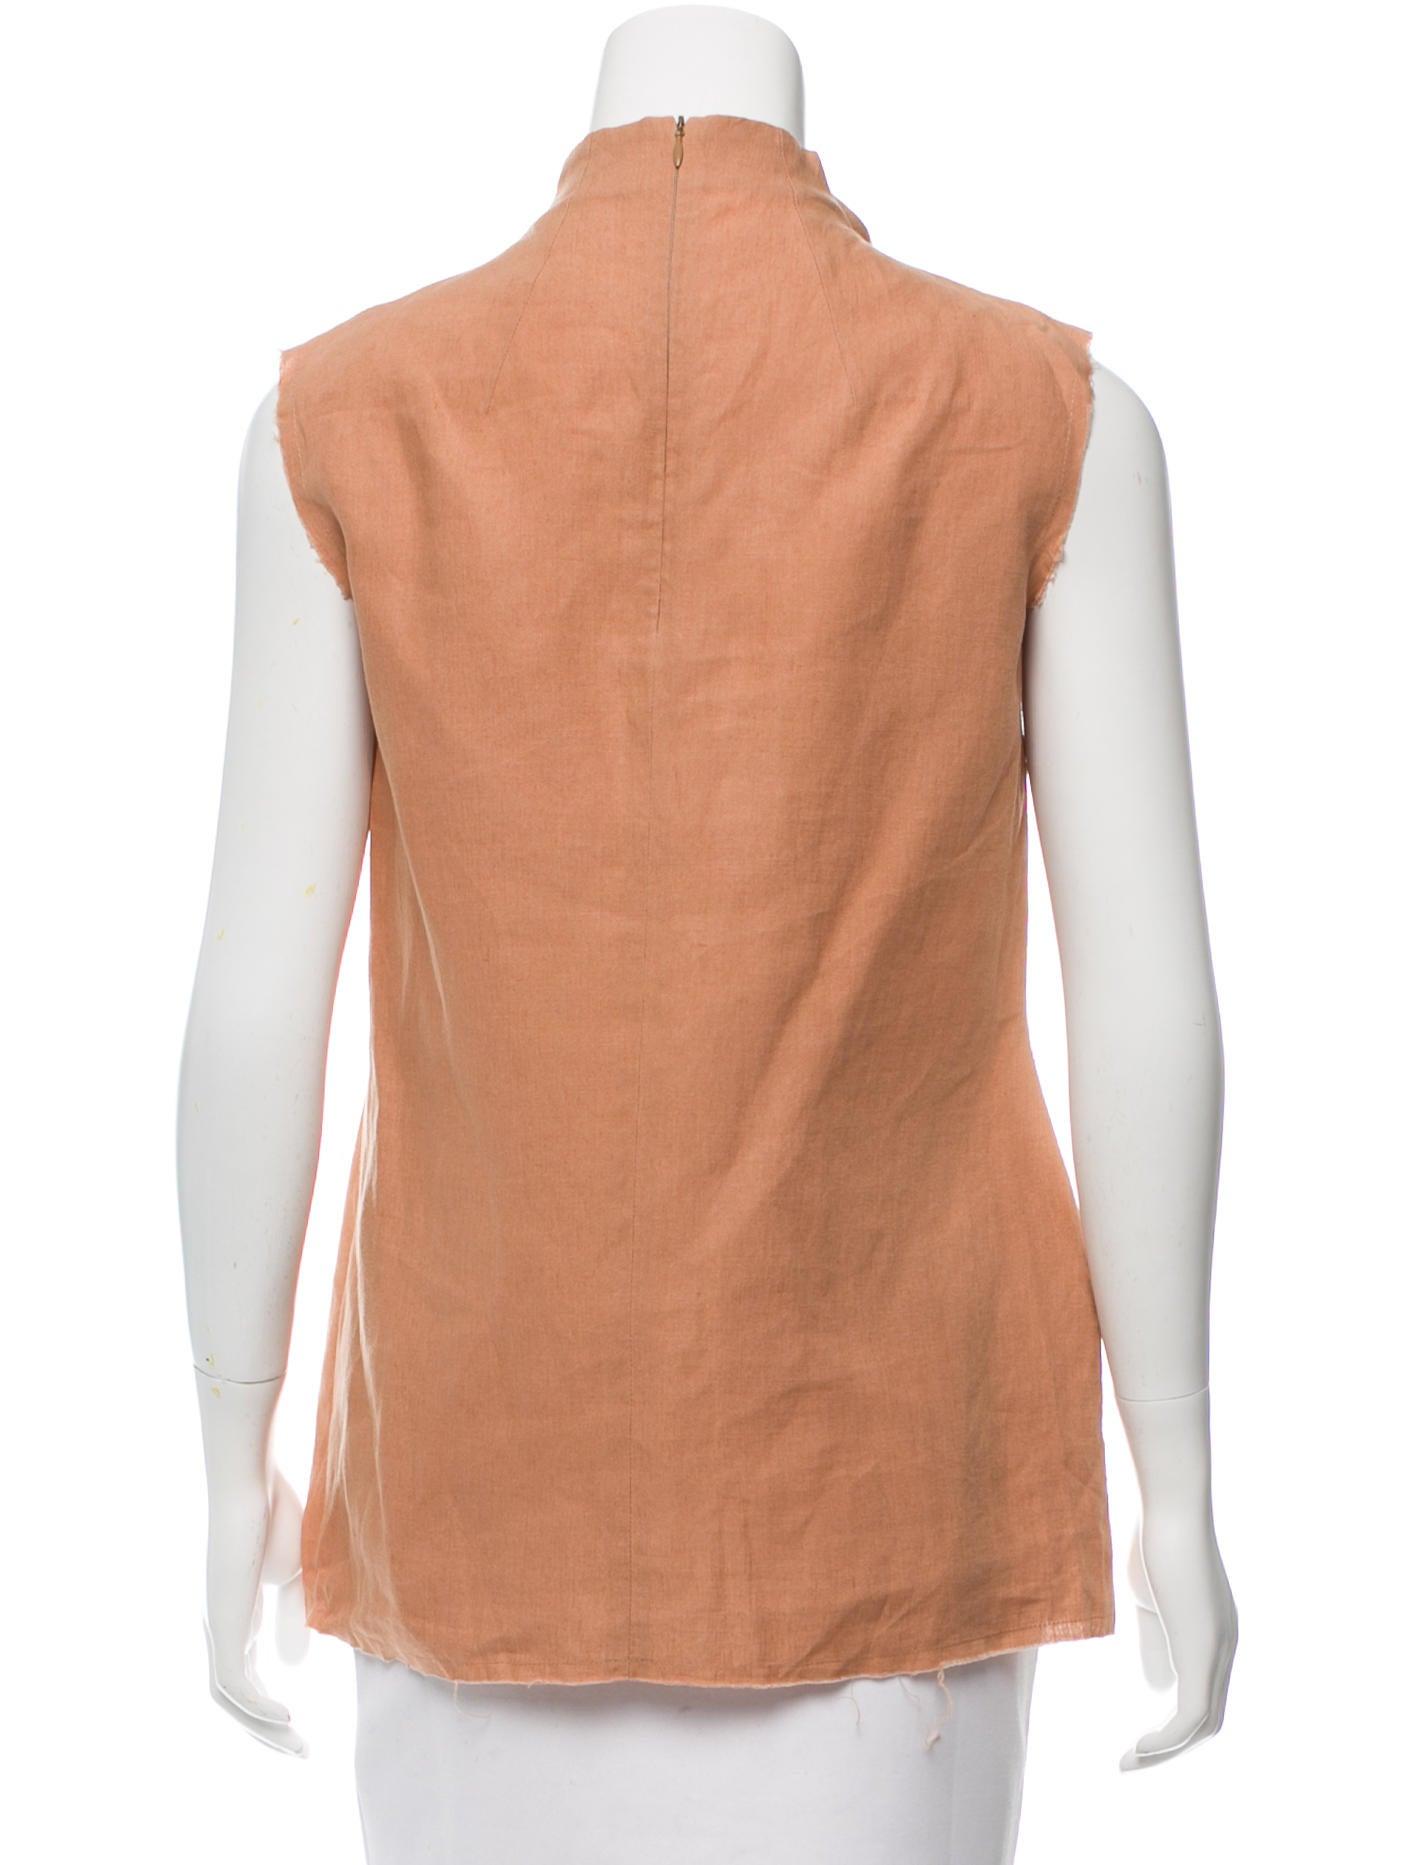 Yves Saint Laurent Sleeveless Mock Neck Top Clothing